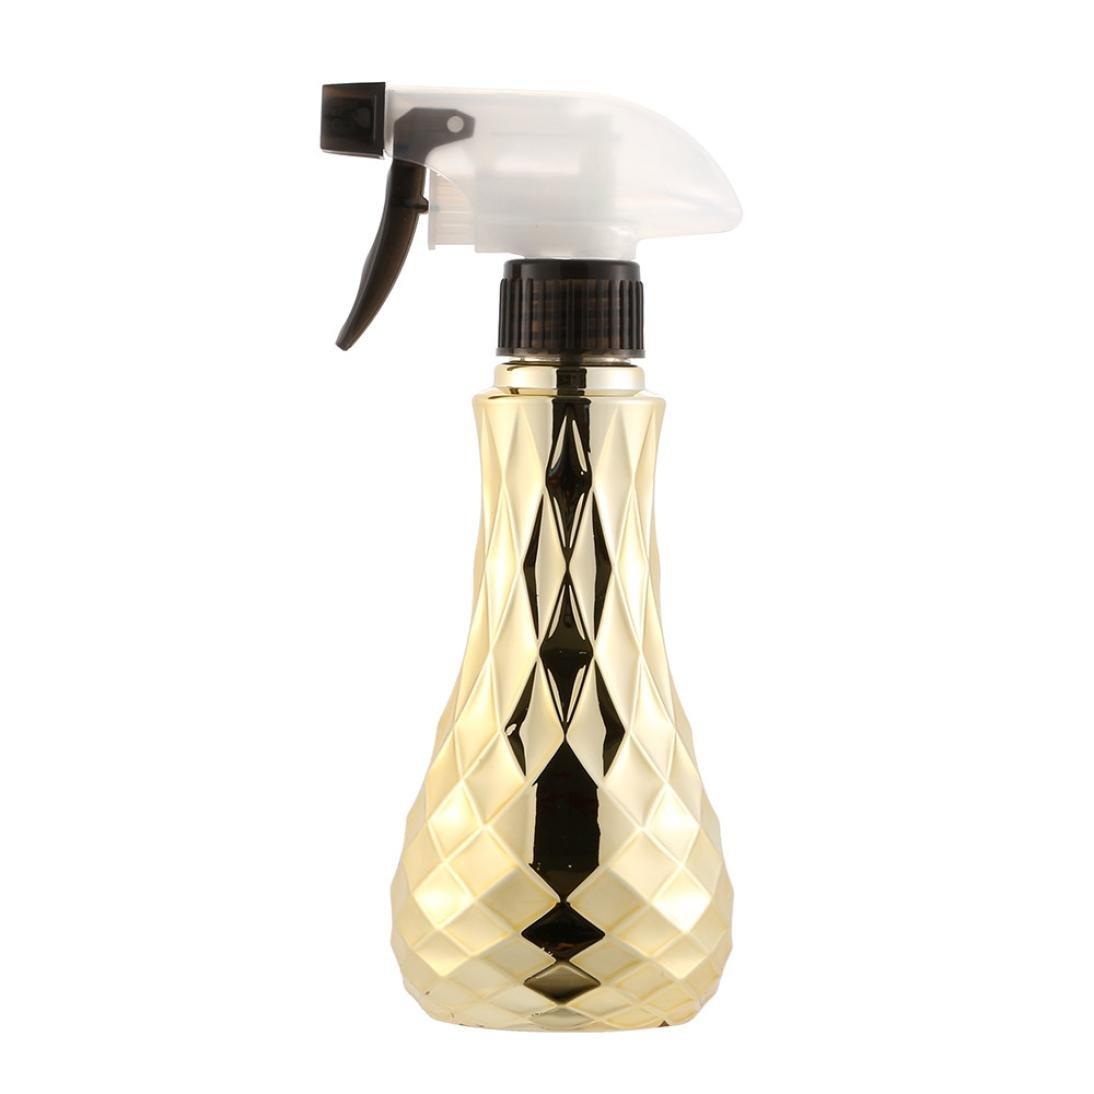 Kolylong 450ML Hairdressing Spray Bottle ✿ Salon Barber Hair Tools Water Sprayer Tools (A) Kolylong Women